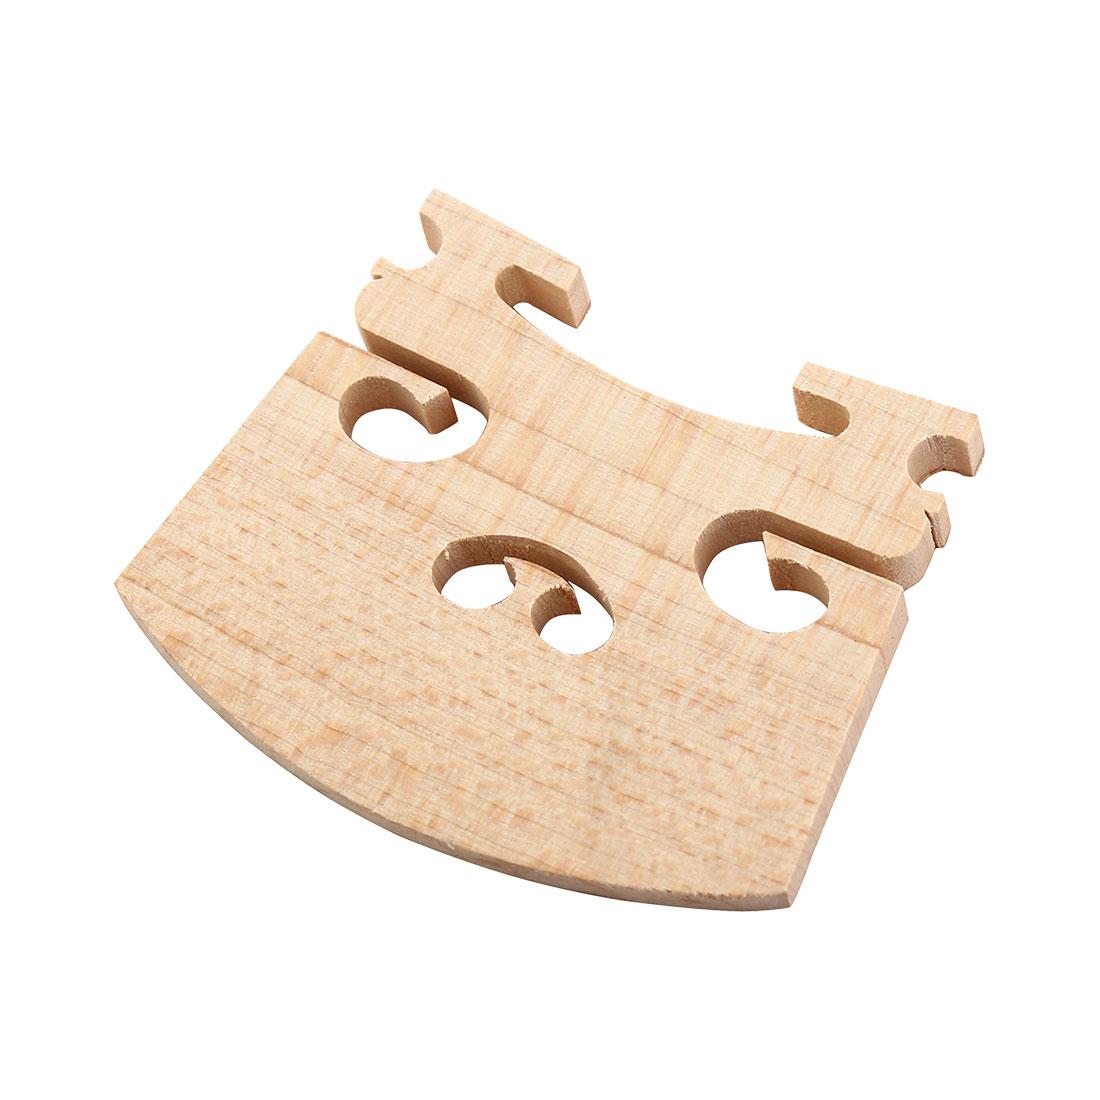 Repairing Parts Musical Wooden Bridge for 4/4 Size Violin